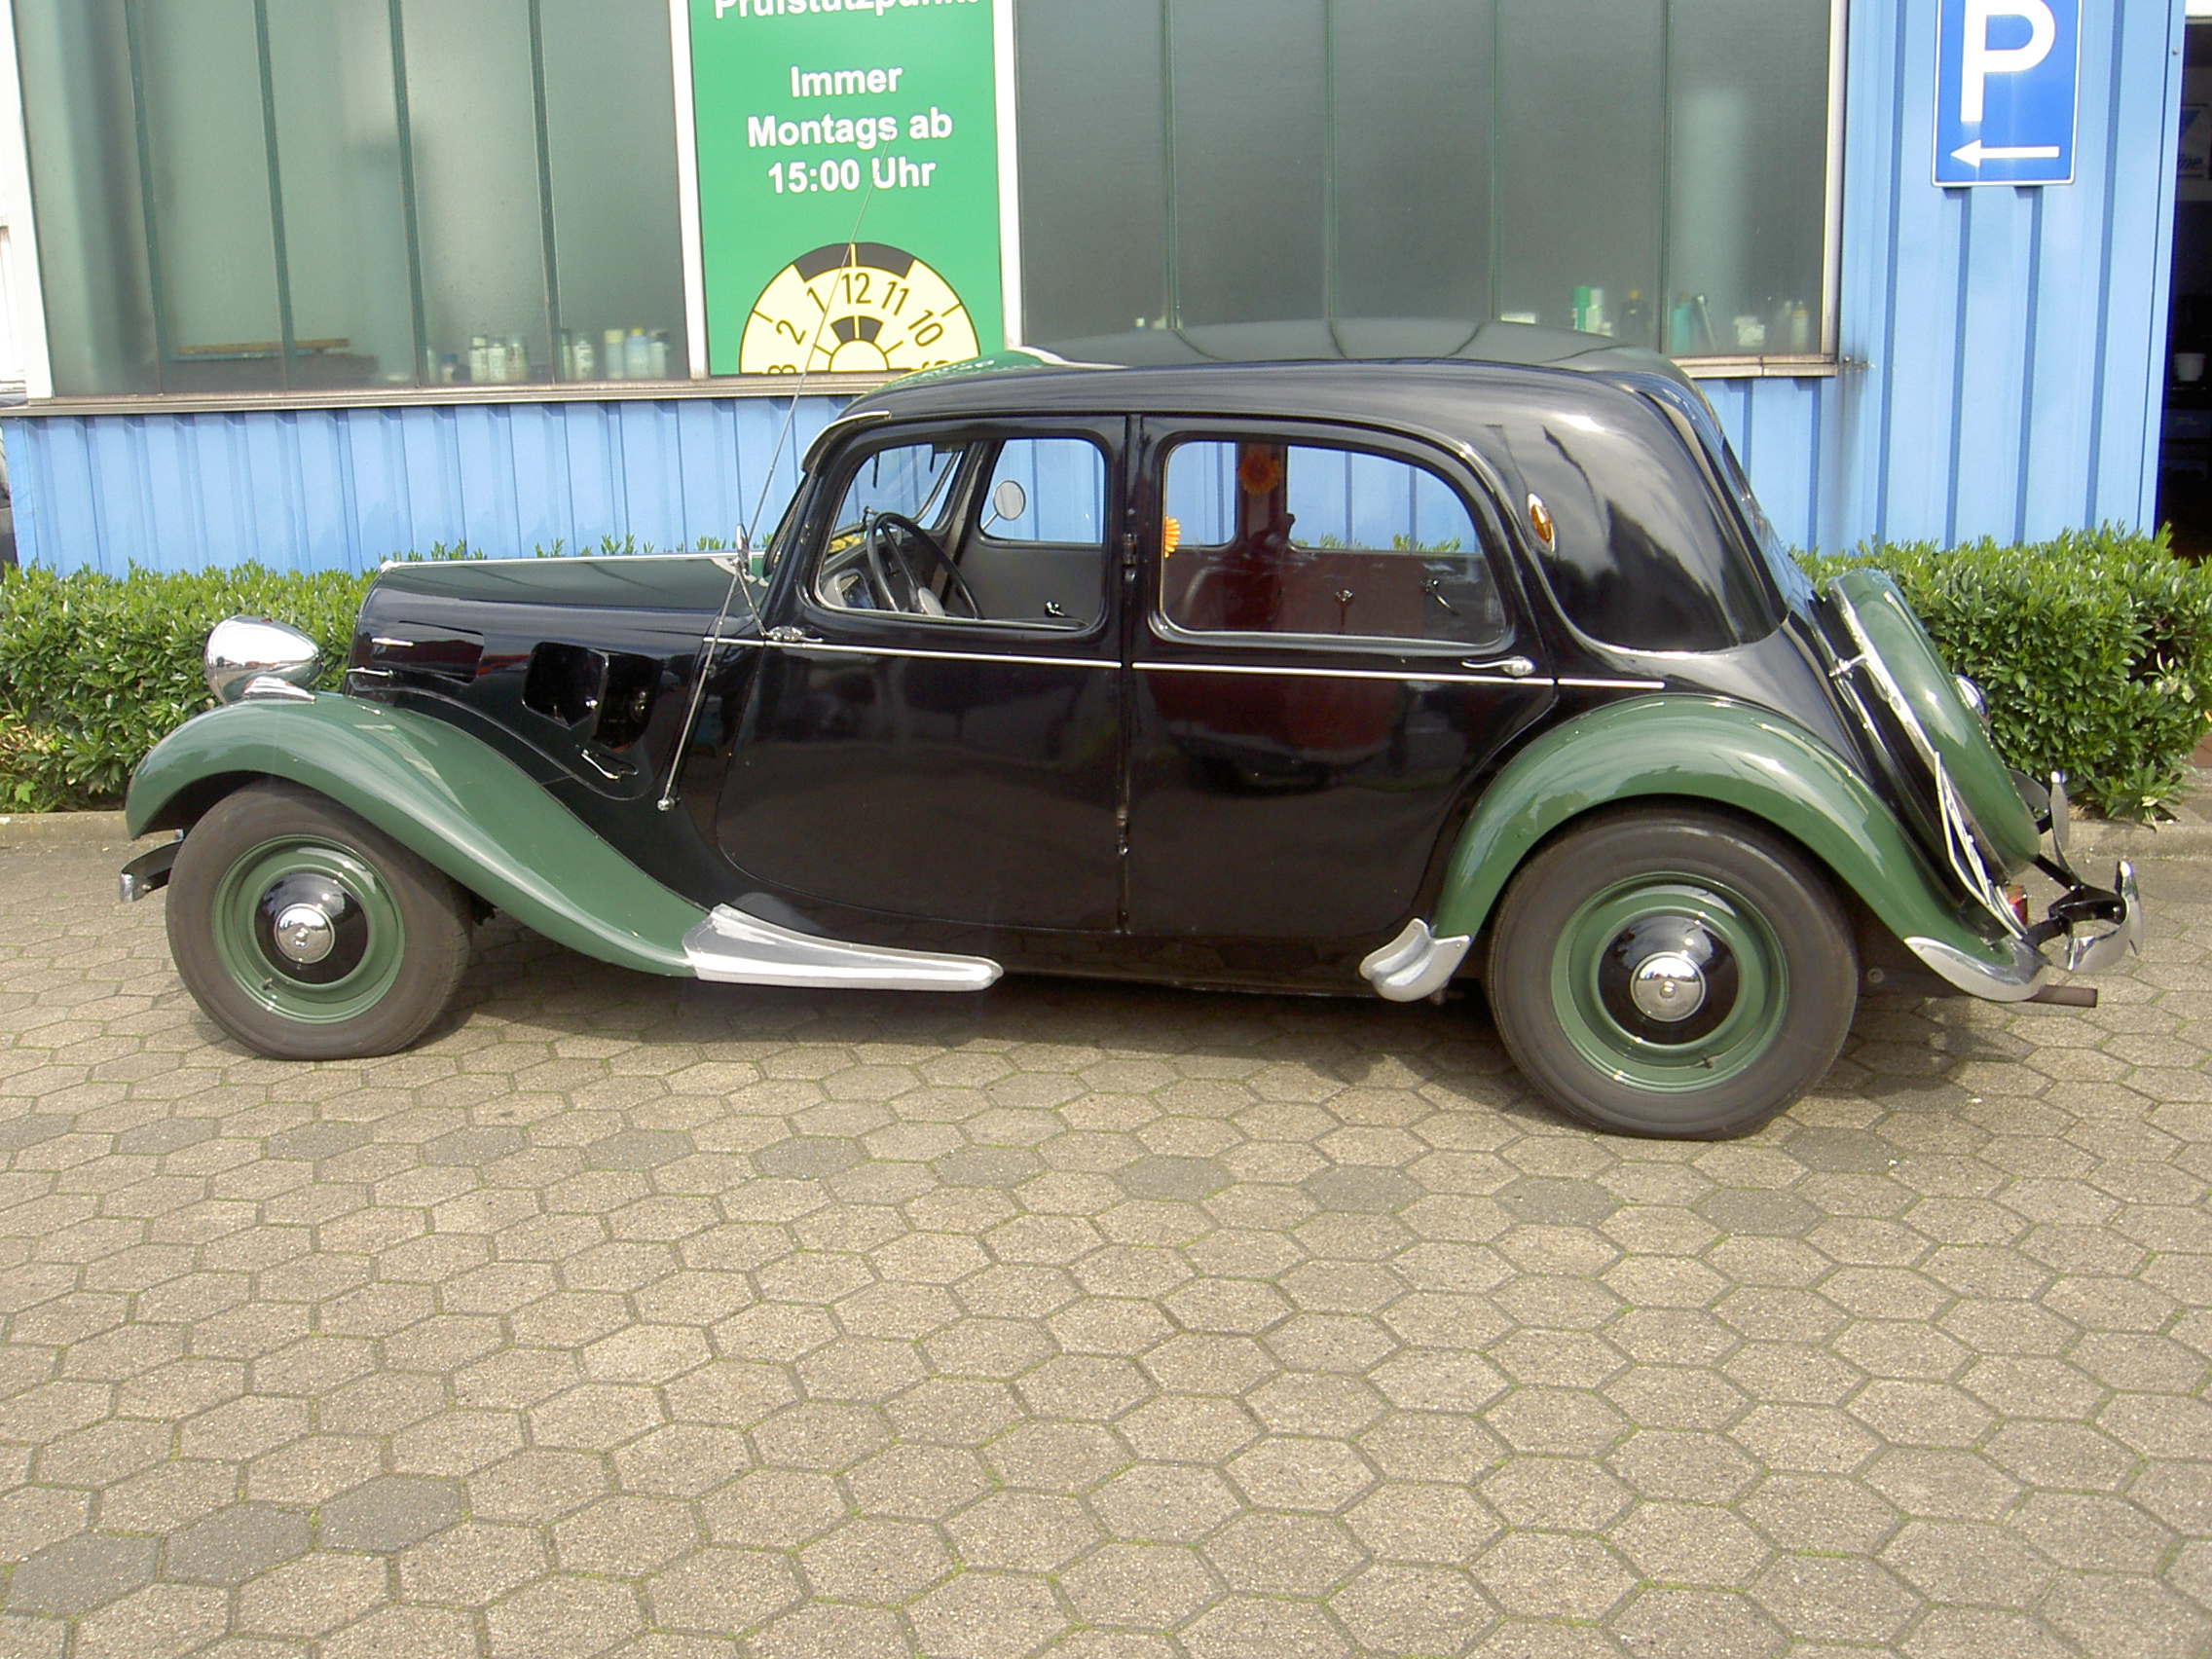 http://autoteile-anhaenger-undmehr.beepworld.de/files/citroenpict6400.jpg?nocache=0.49754483284904094